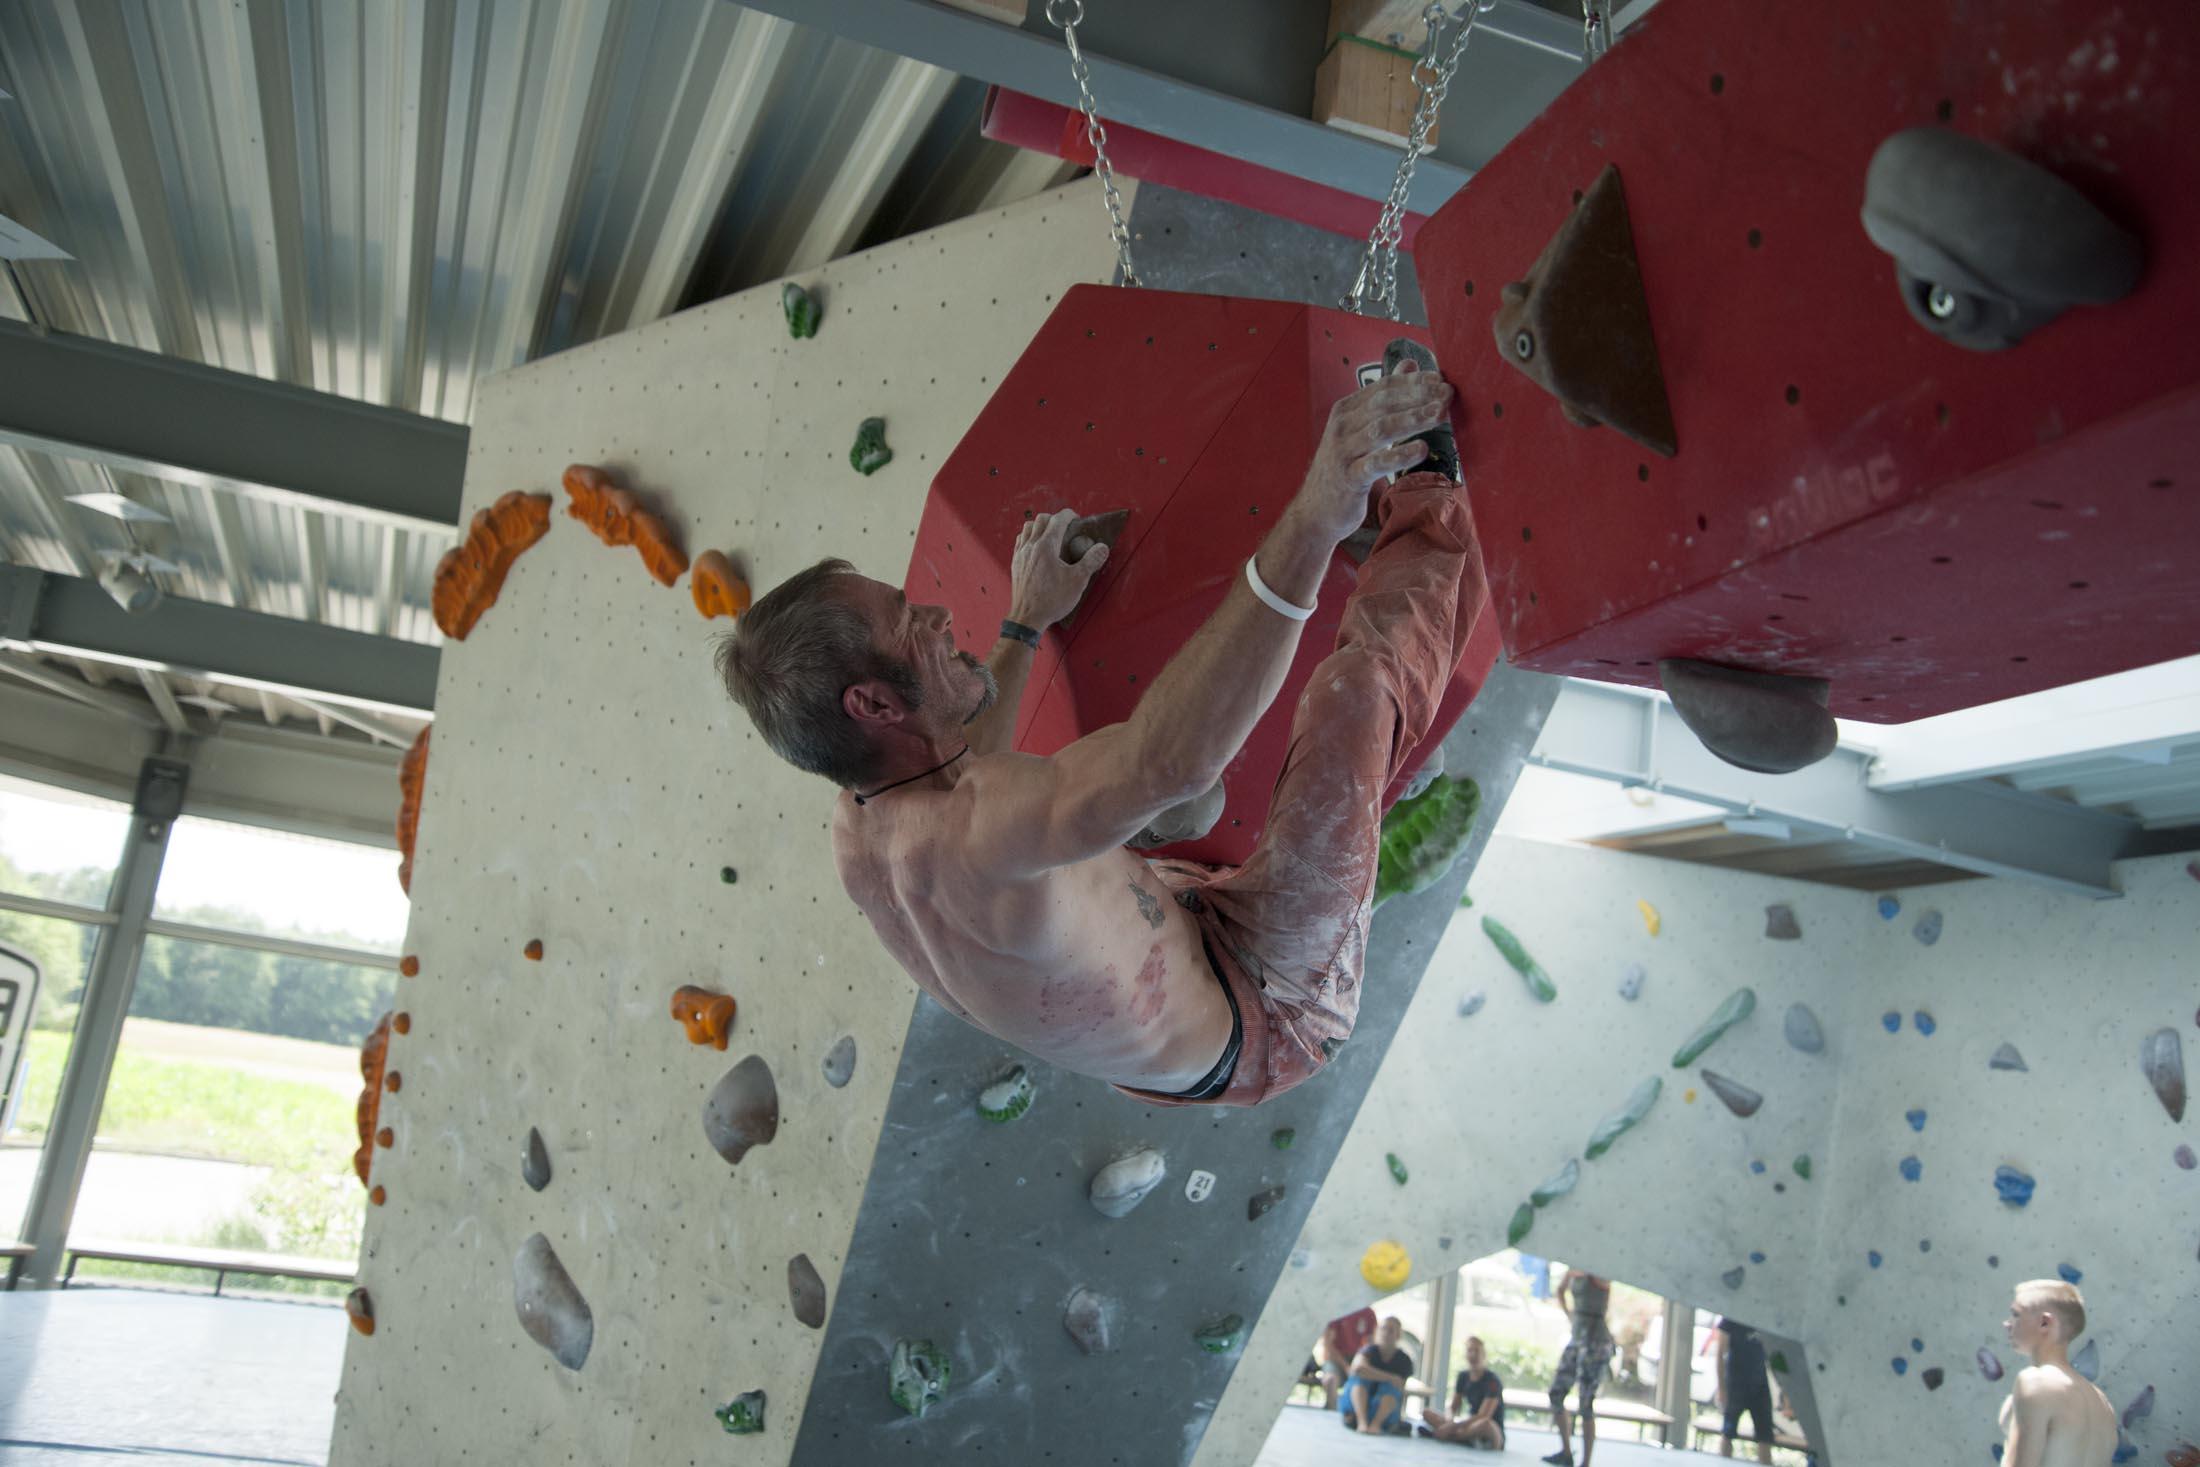 Quali, internationaler bouldercup Frankenjura 2016, BLOCKHELDEN Erlangen, Mammut, Bergfreunde.de, Boulderwettkampf07092016228